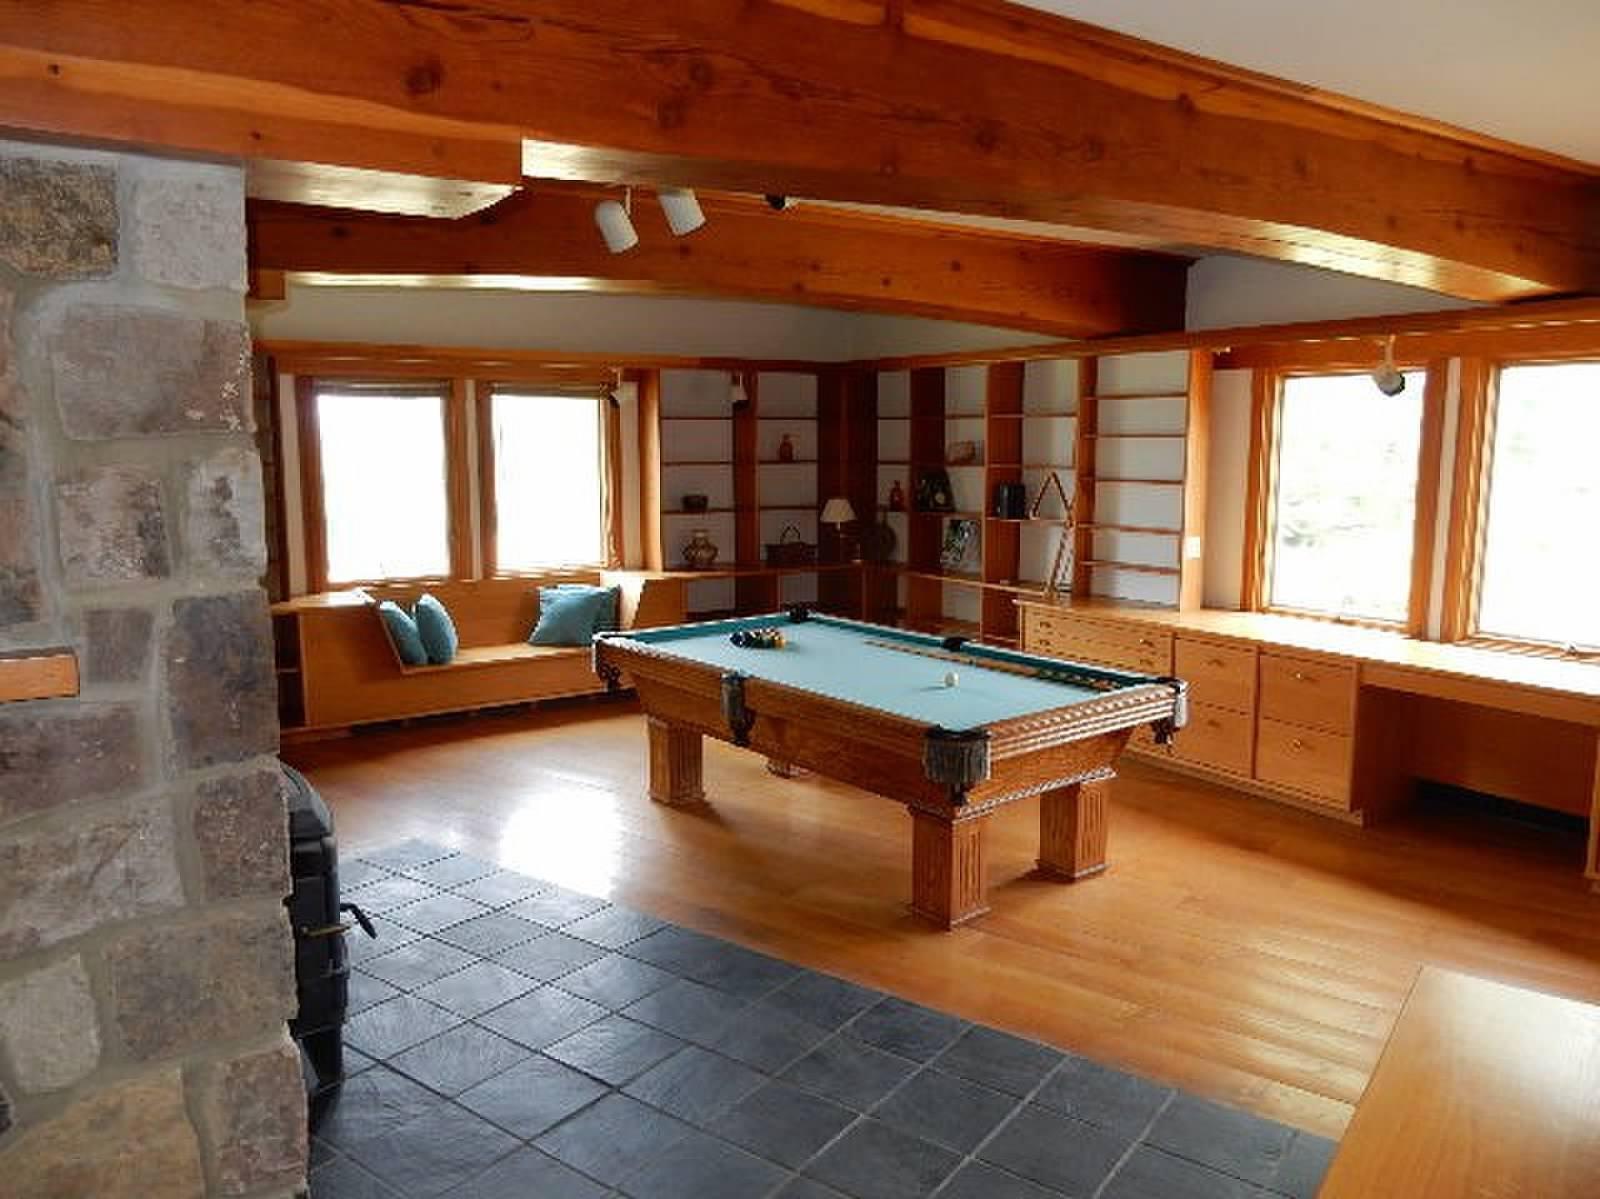 Main Floor Library/Pool Room